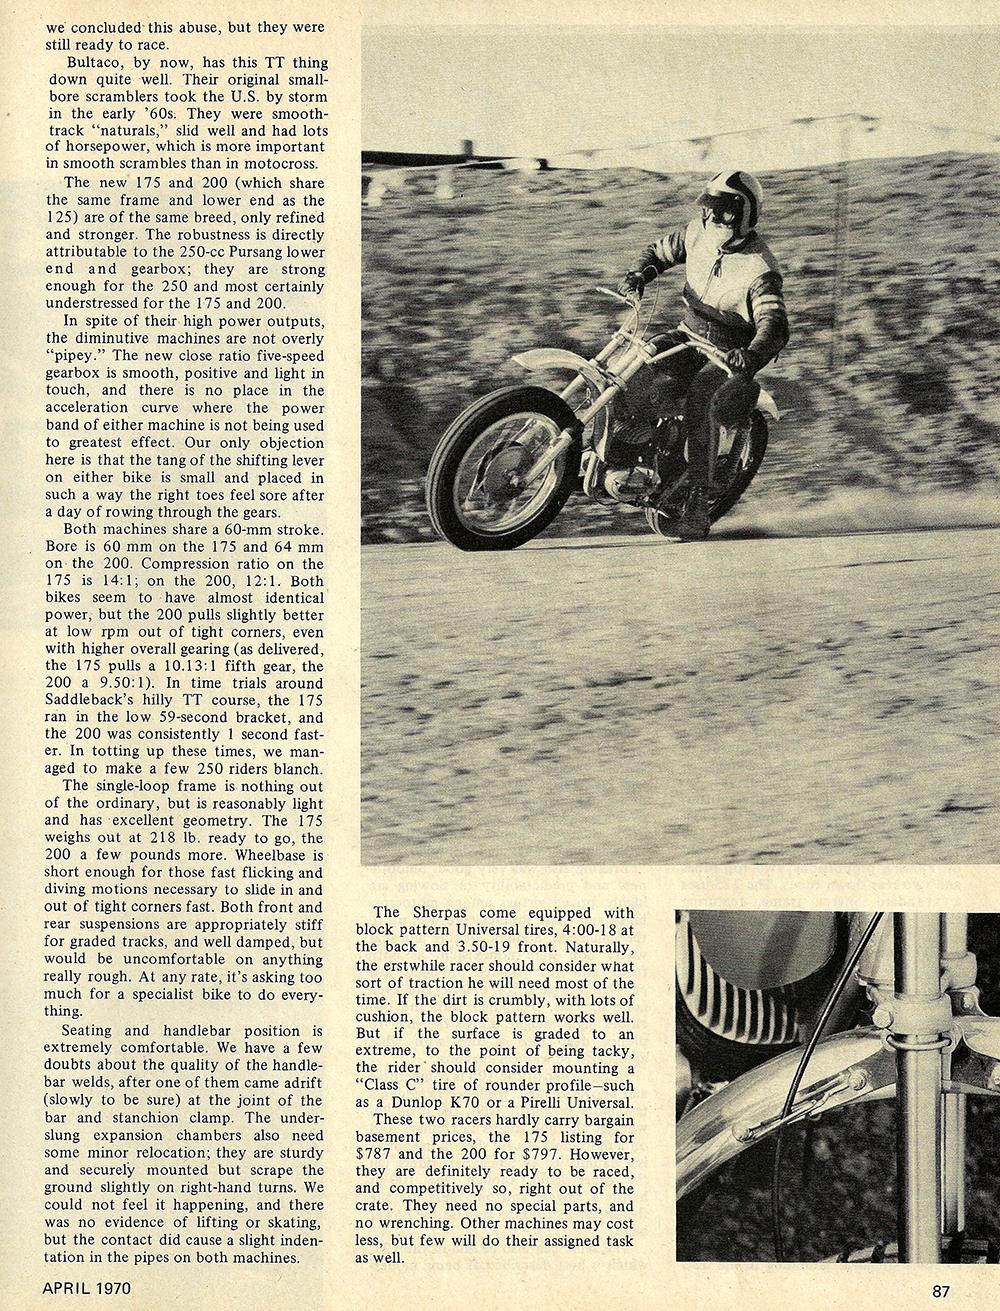 1970 Bultaco Sherpa 175 and 200 road test 02.jpg